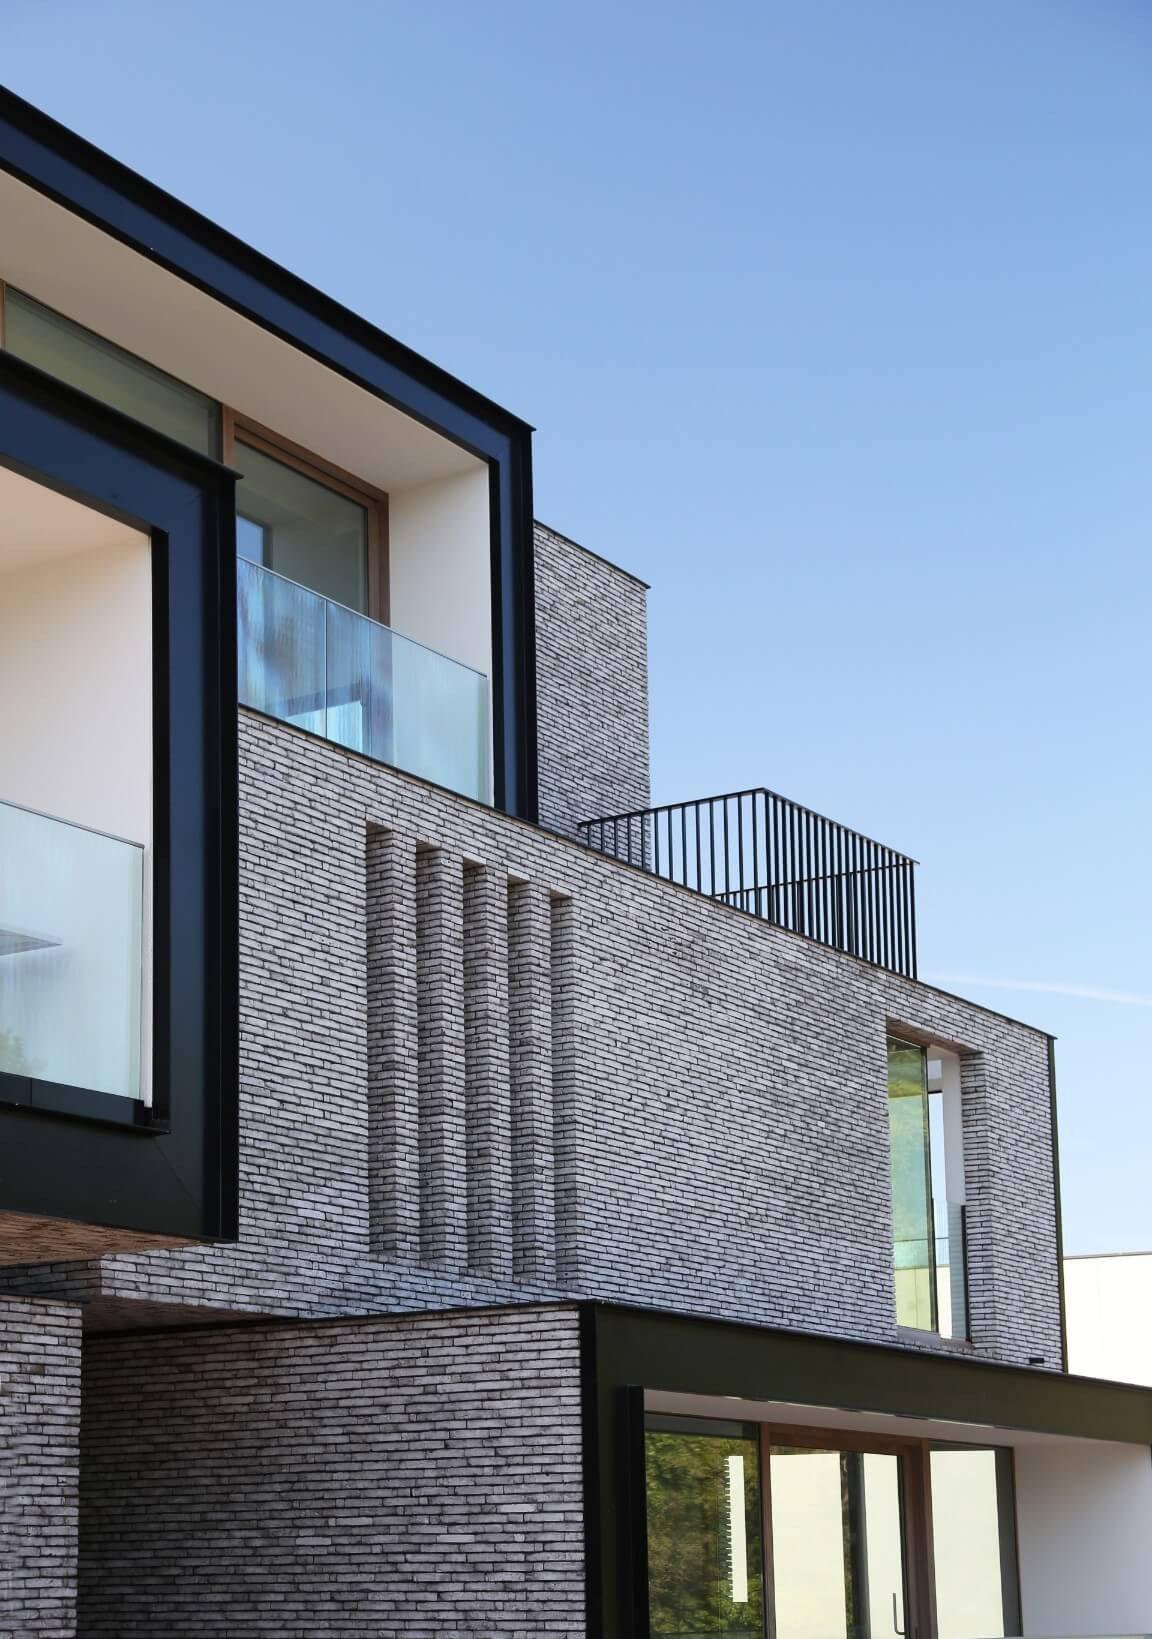 Rietveldprojects.be-Bauhaus-appartement-design-architectuur-kust2.jpg